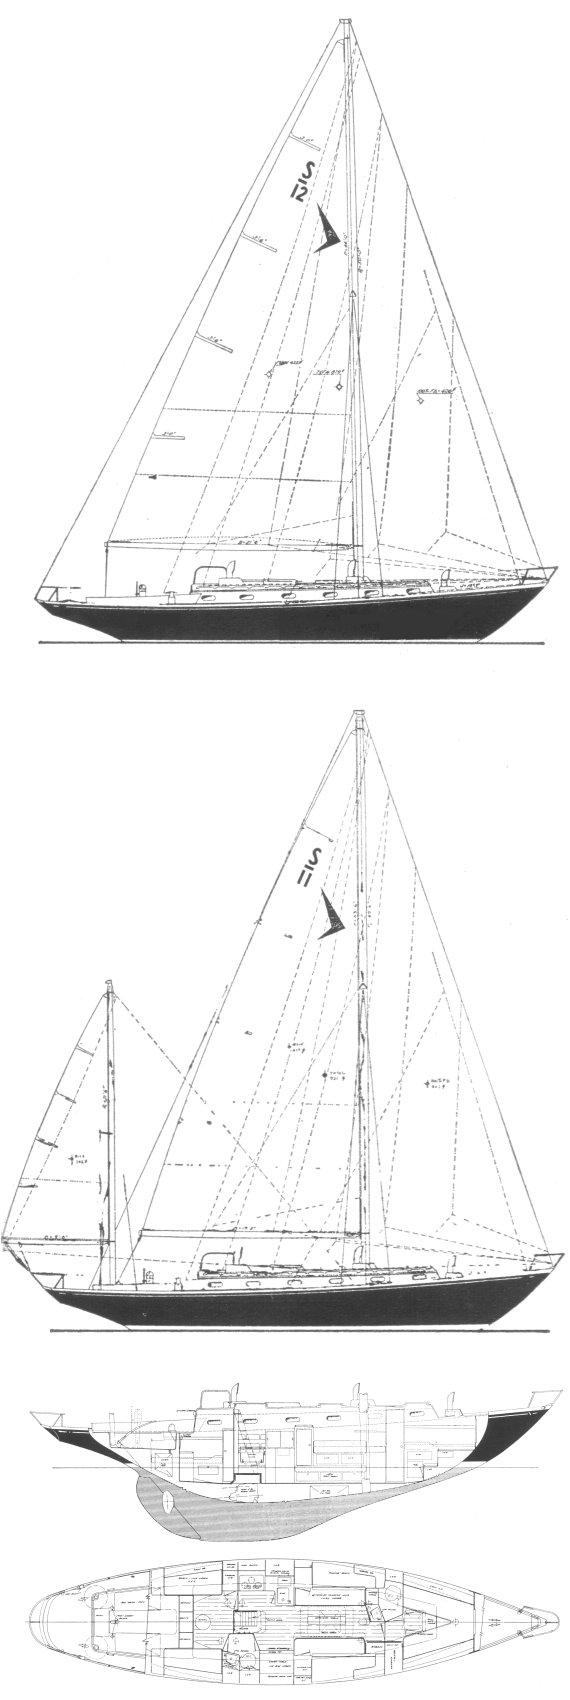 SEAFARER 45 drawing